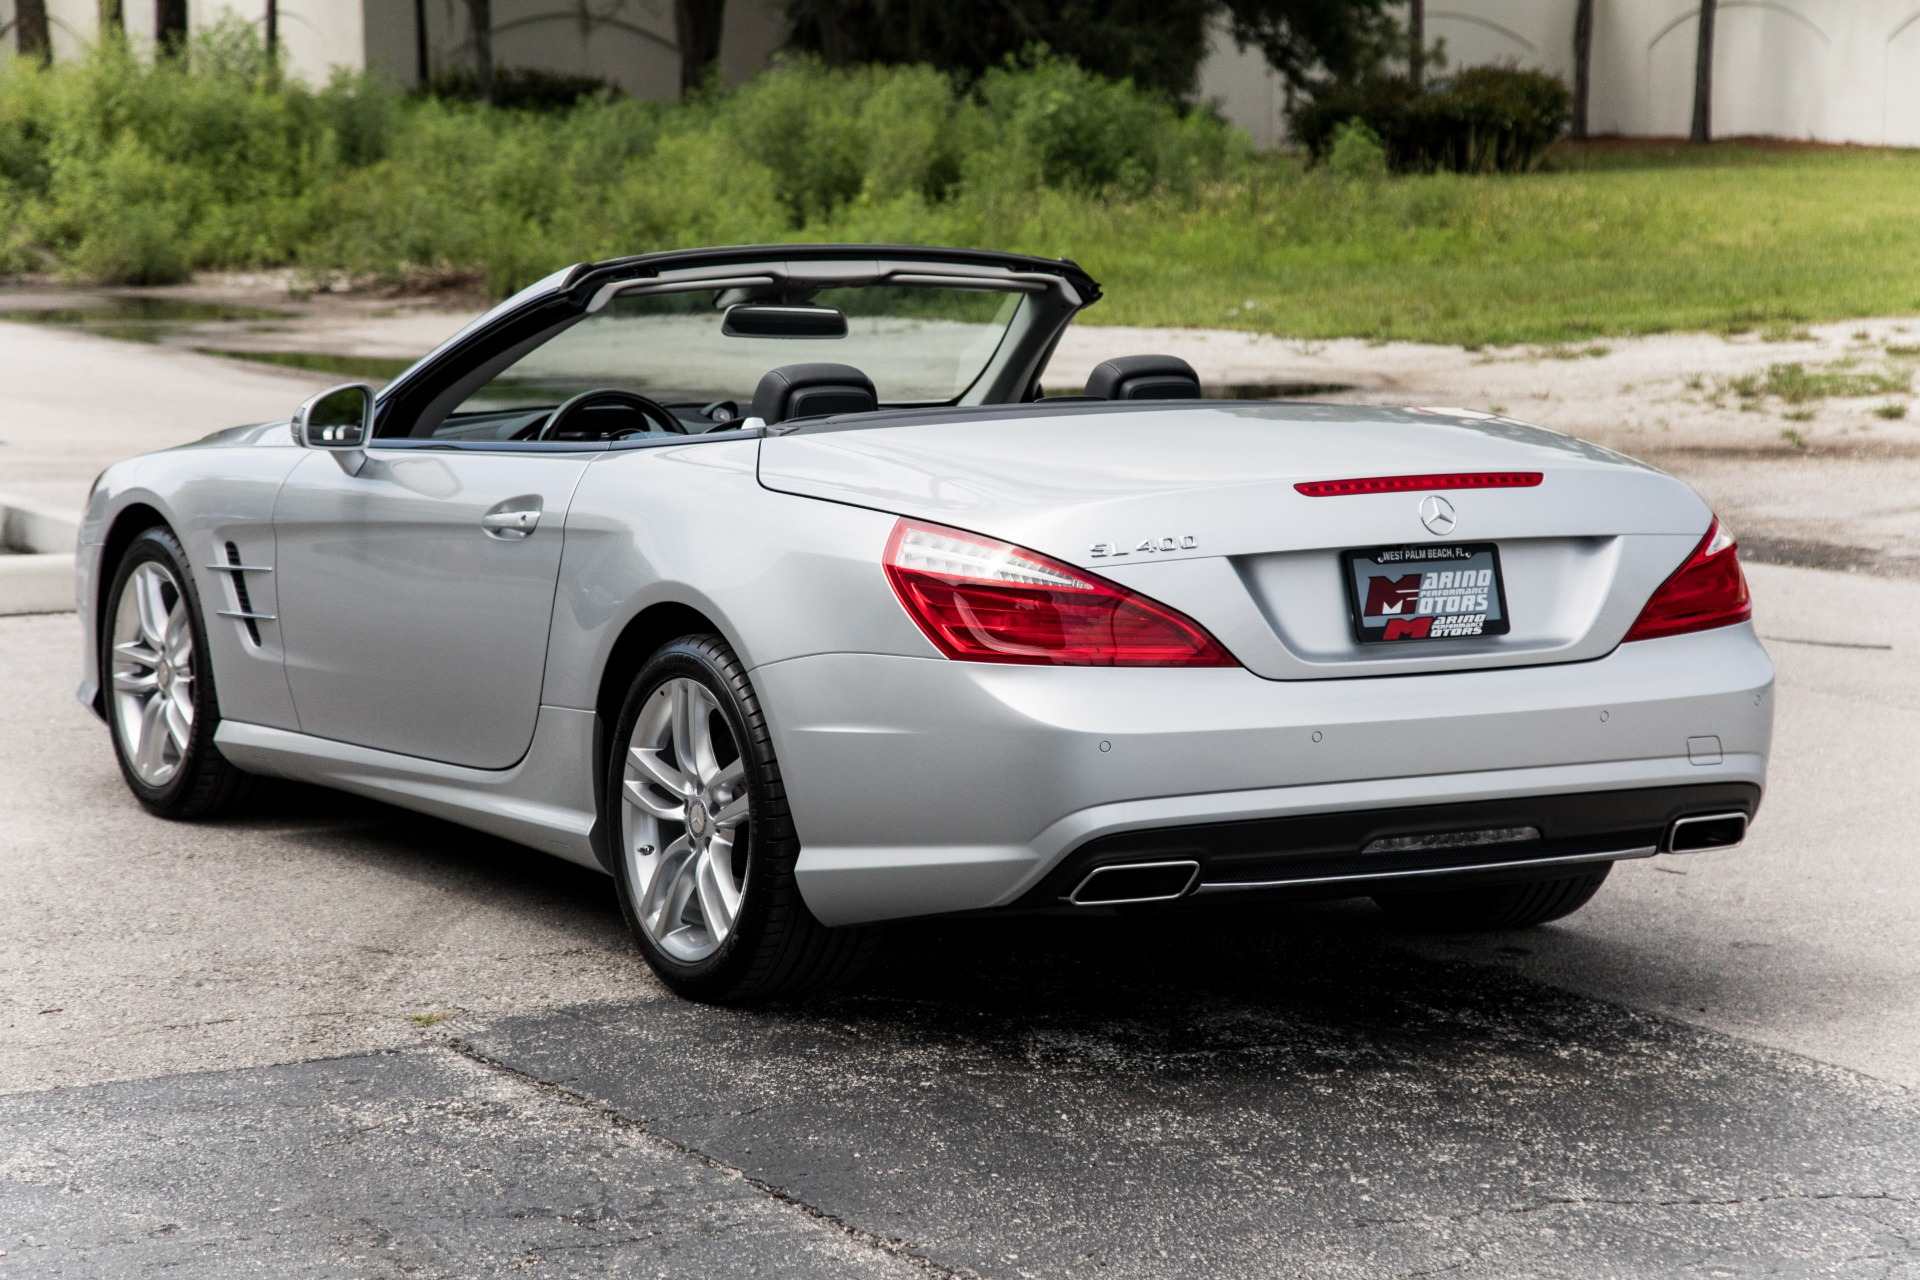 Used-2015-Mercedes-Benz-SL-Class-SL-400